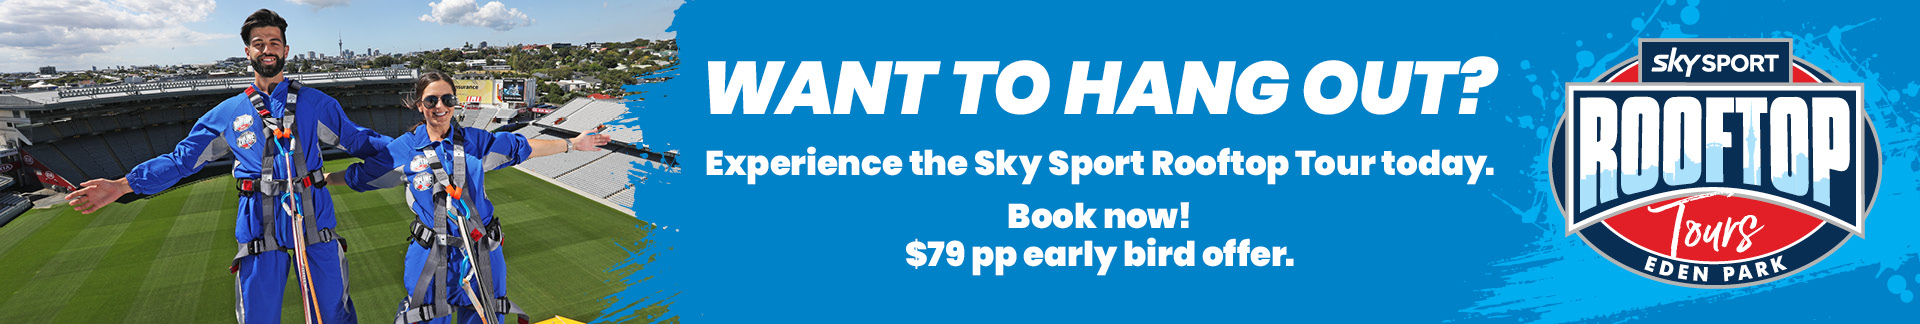 Sky Sport Rooftop Tour